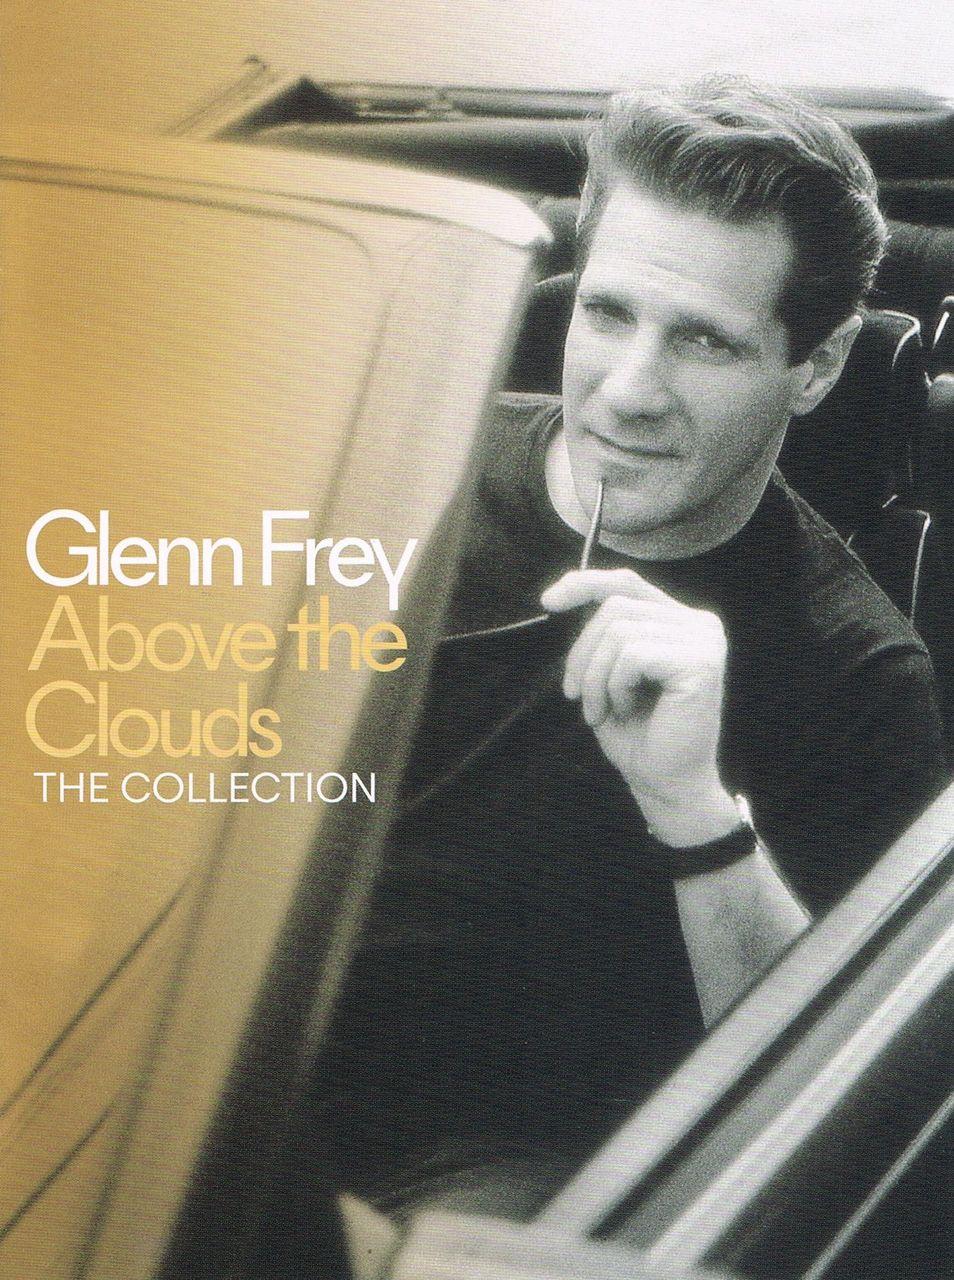 glenn frey collection